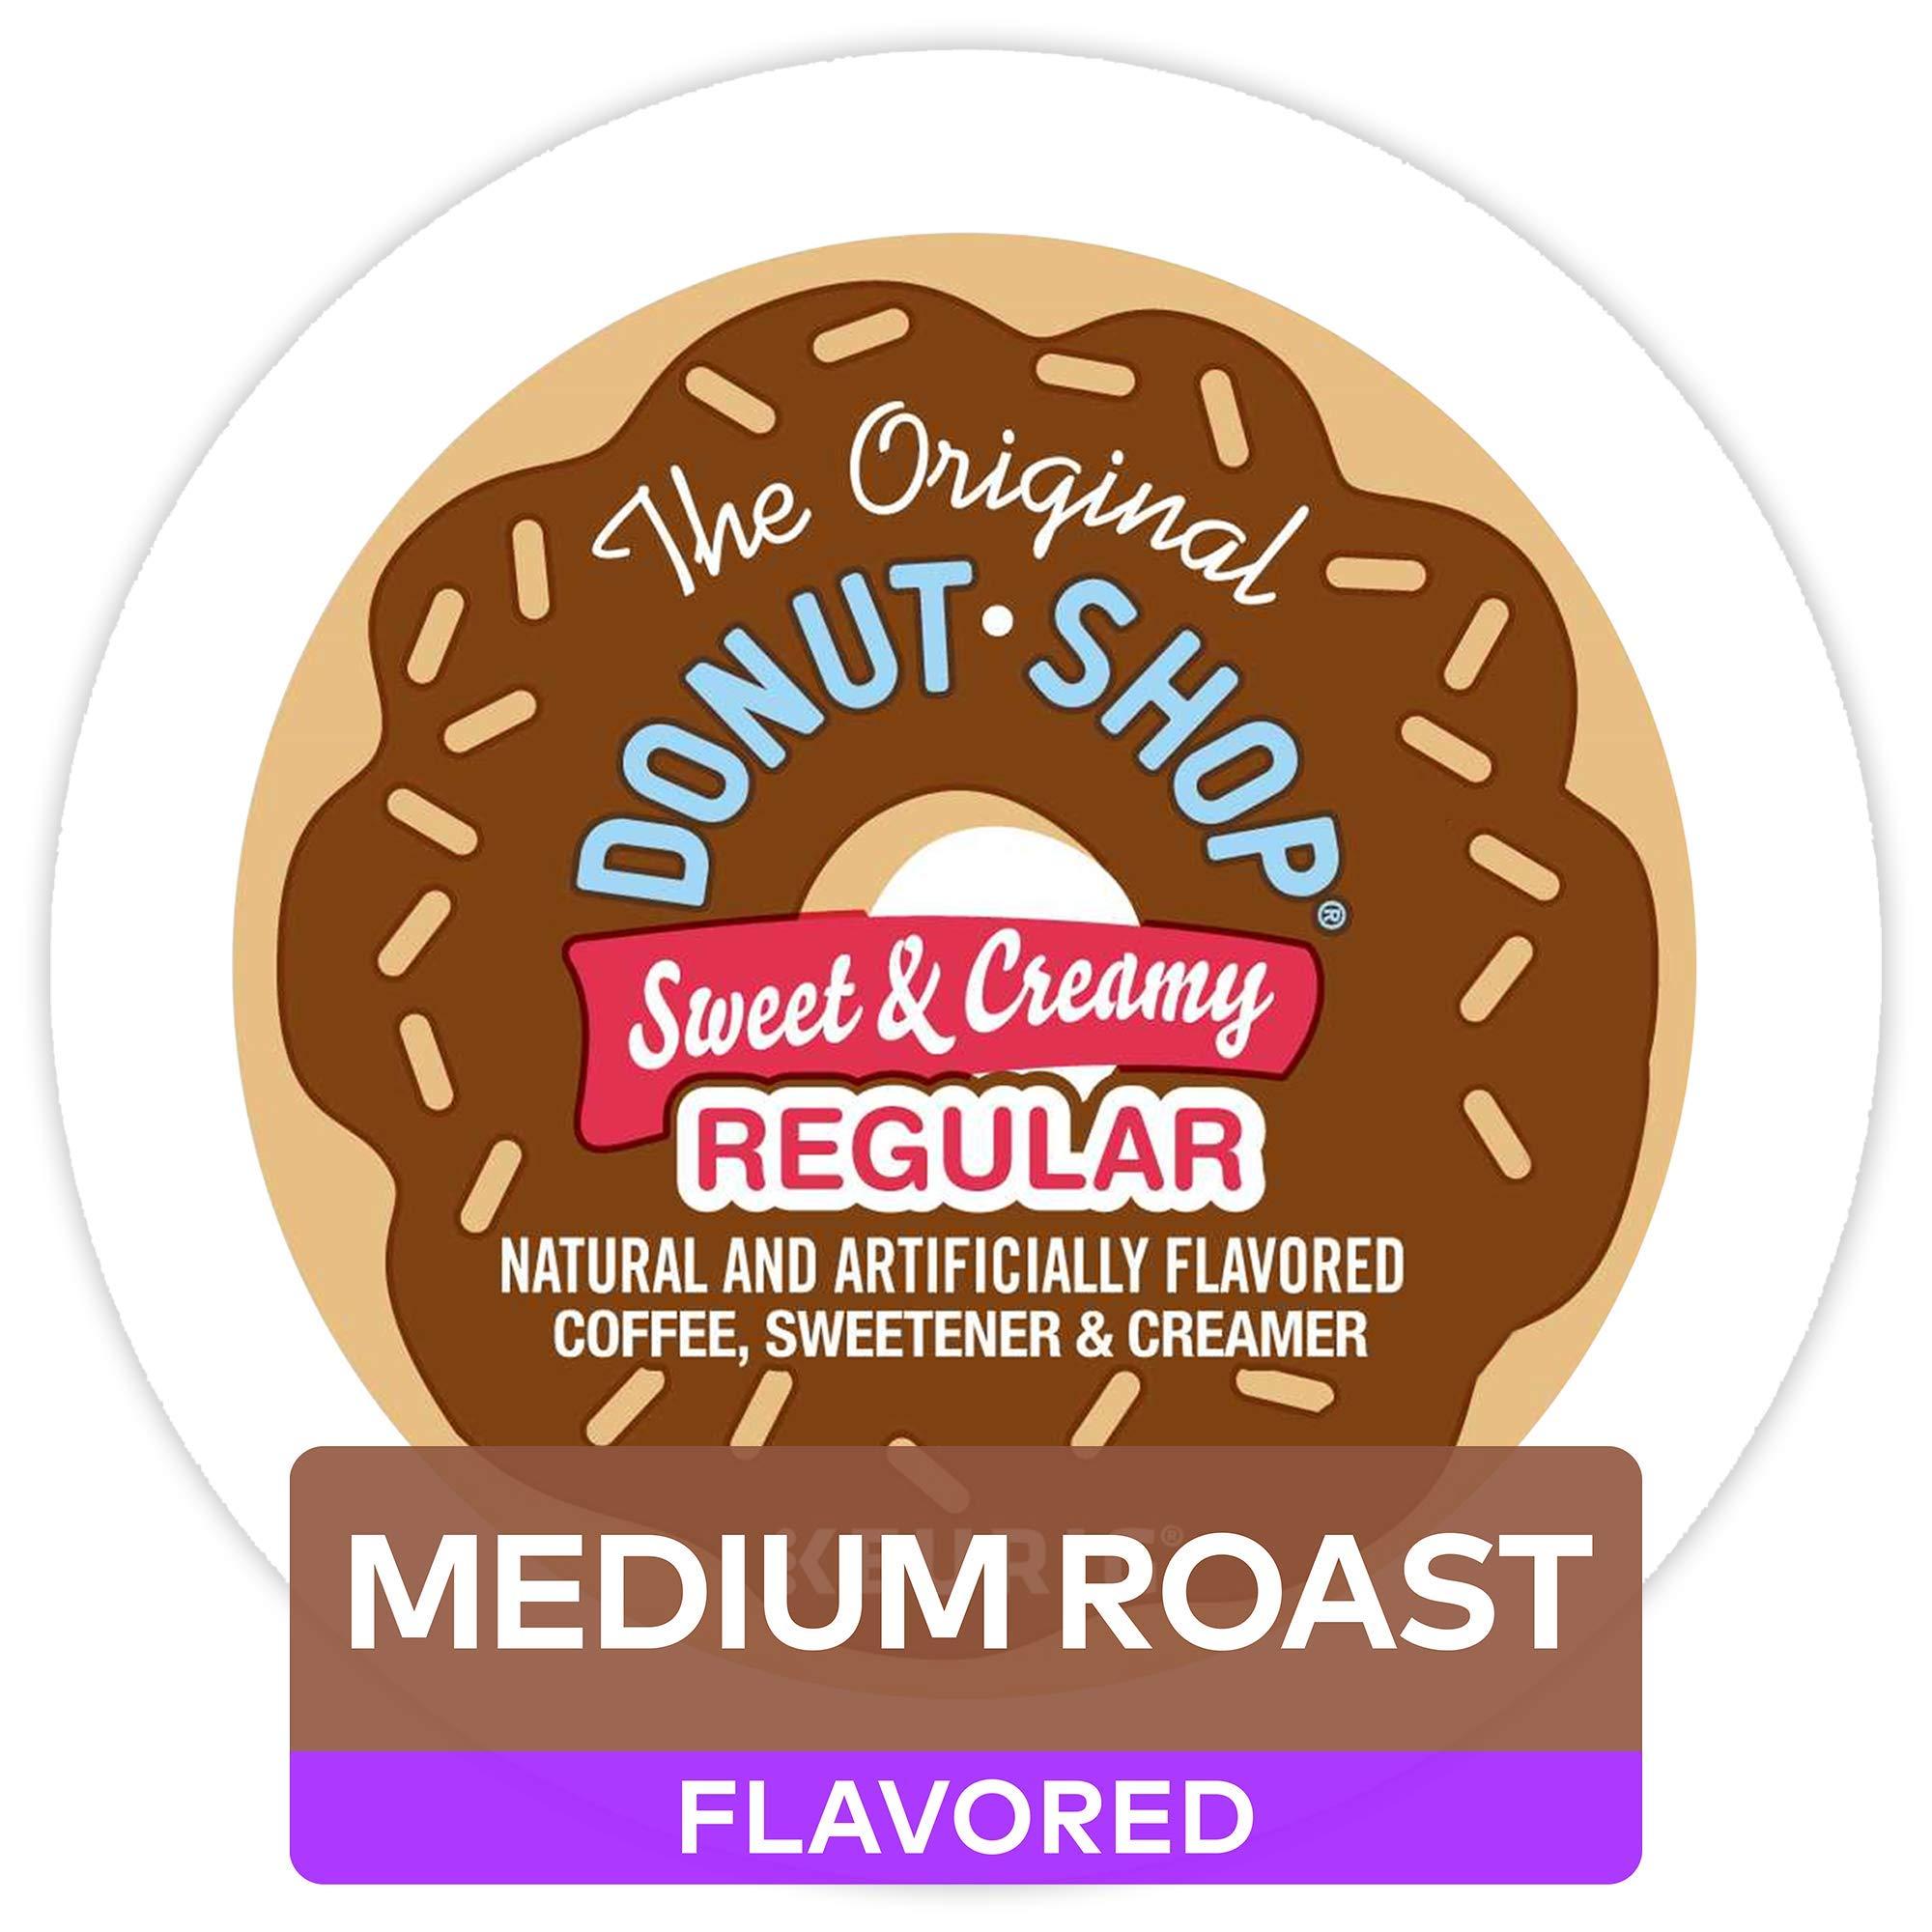 The Original Donut Shop Keurig Single-Serve K-Cup Pods, Medium Roast Coffee, 60 Count by The Original Donut Shop